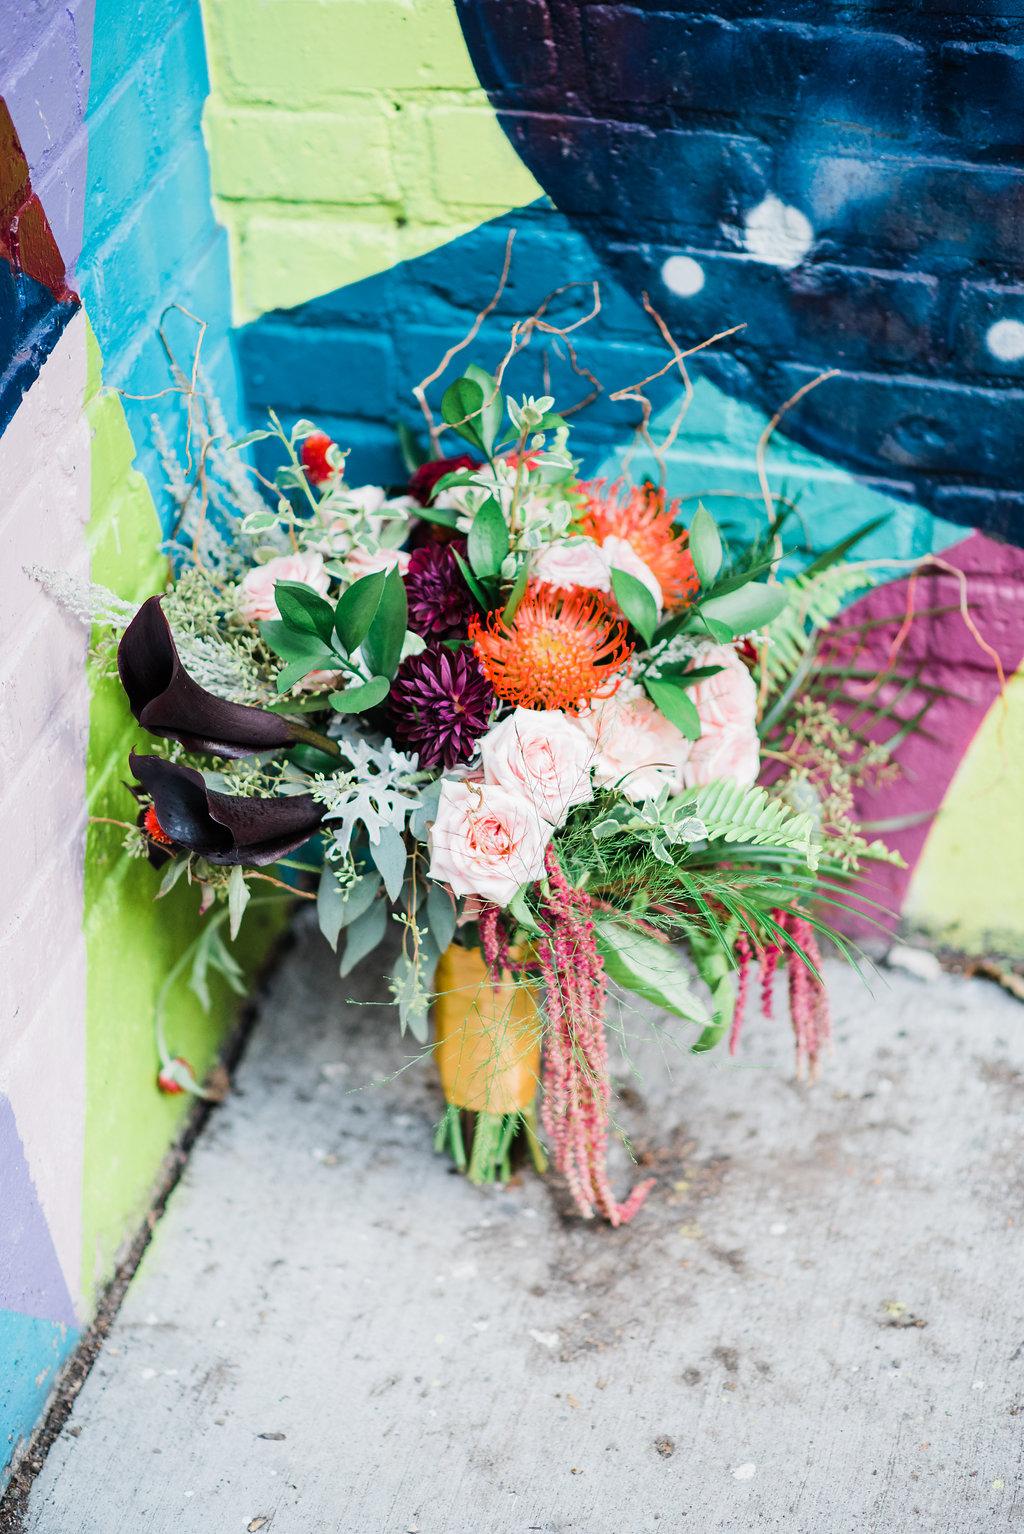 Milwaukee-Wisconsin-Wedding-Photographer-Black-Cat-Alley-Styled-Bridal-Shoot-10.jpg